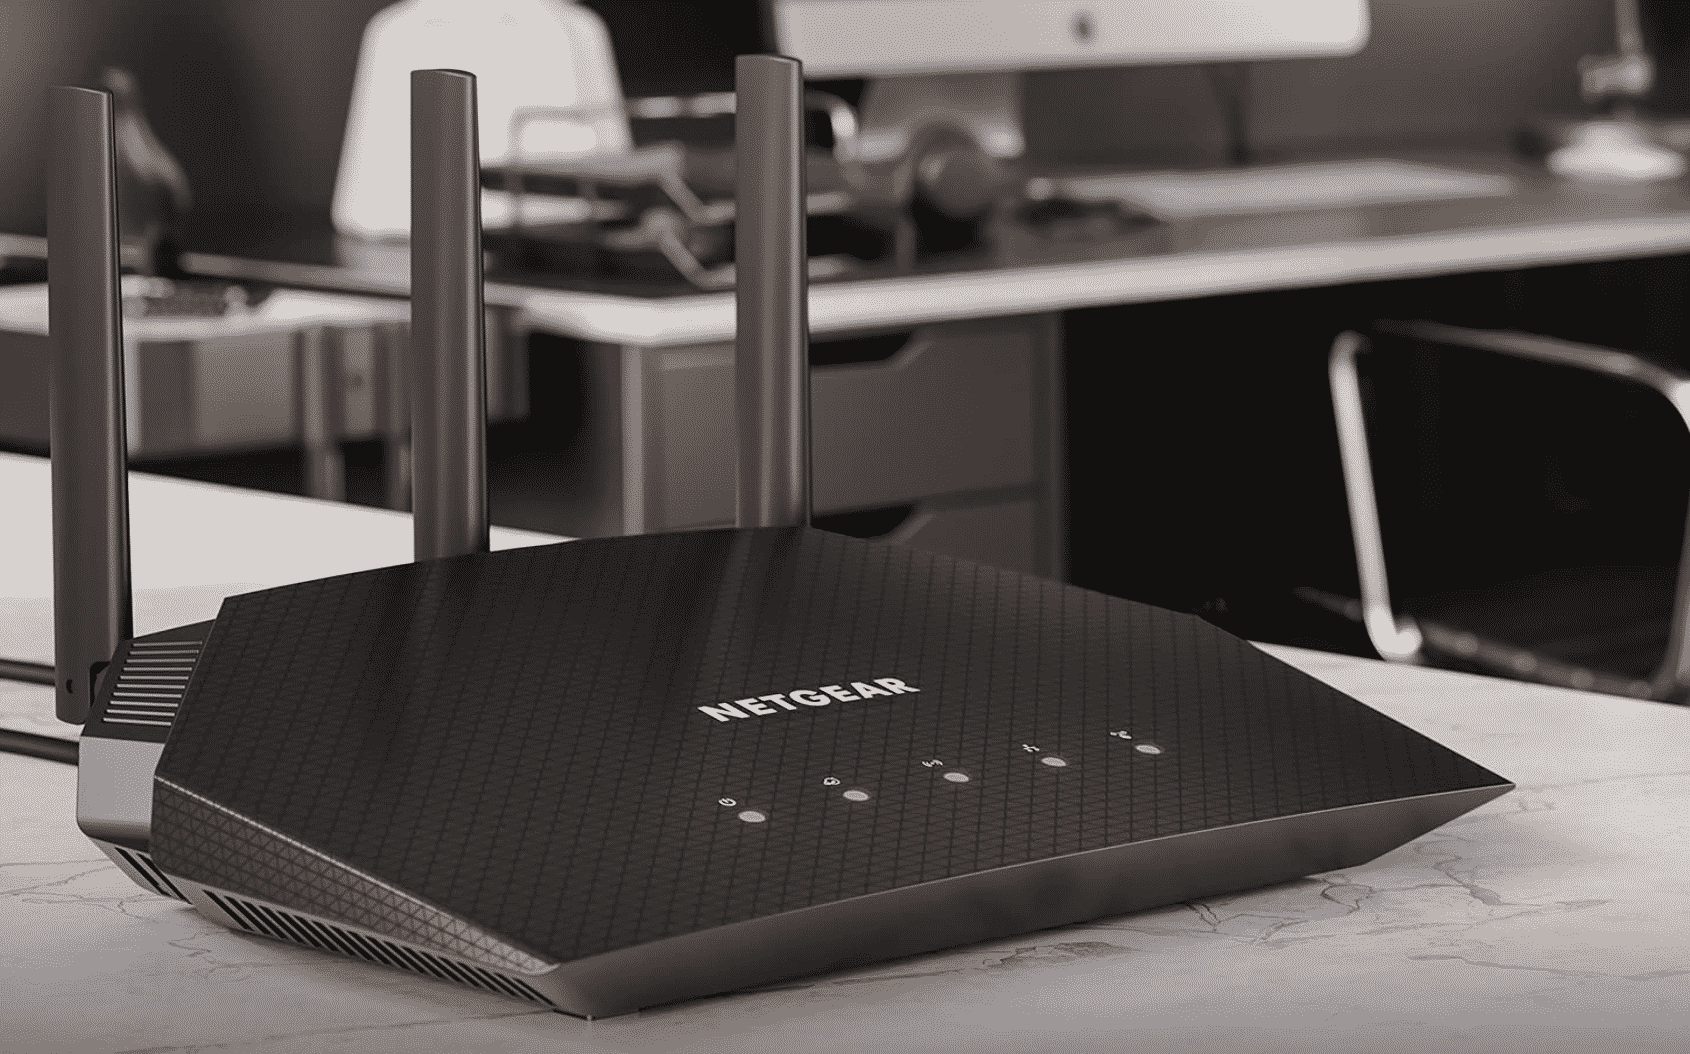 NETGEAR 4-Stream WiFi 6 Router